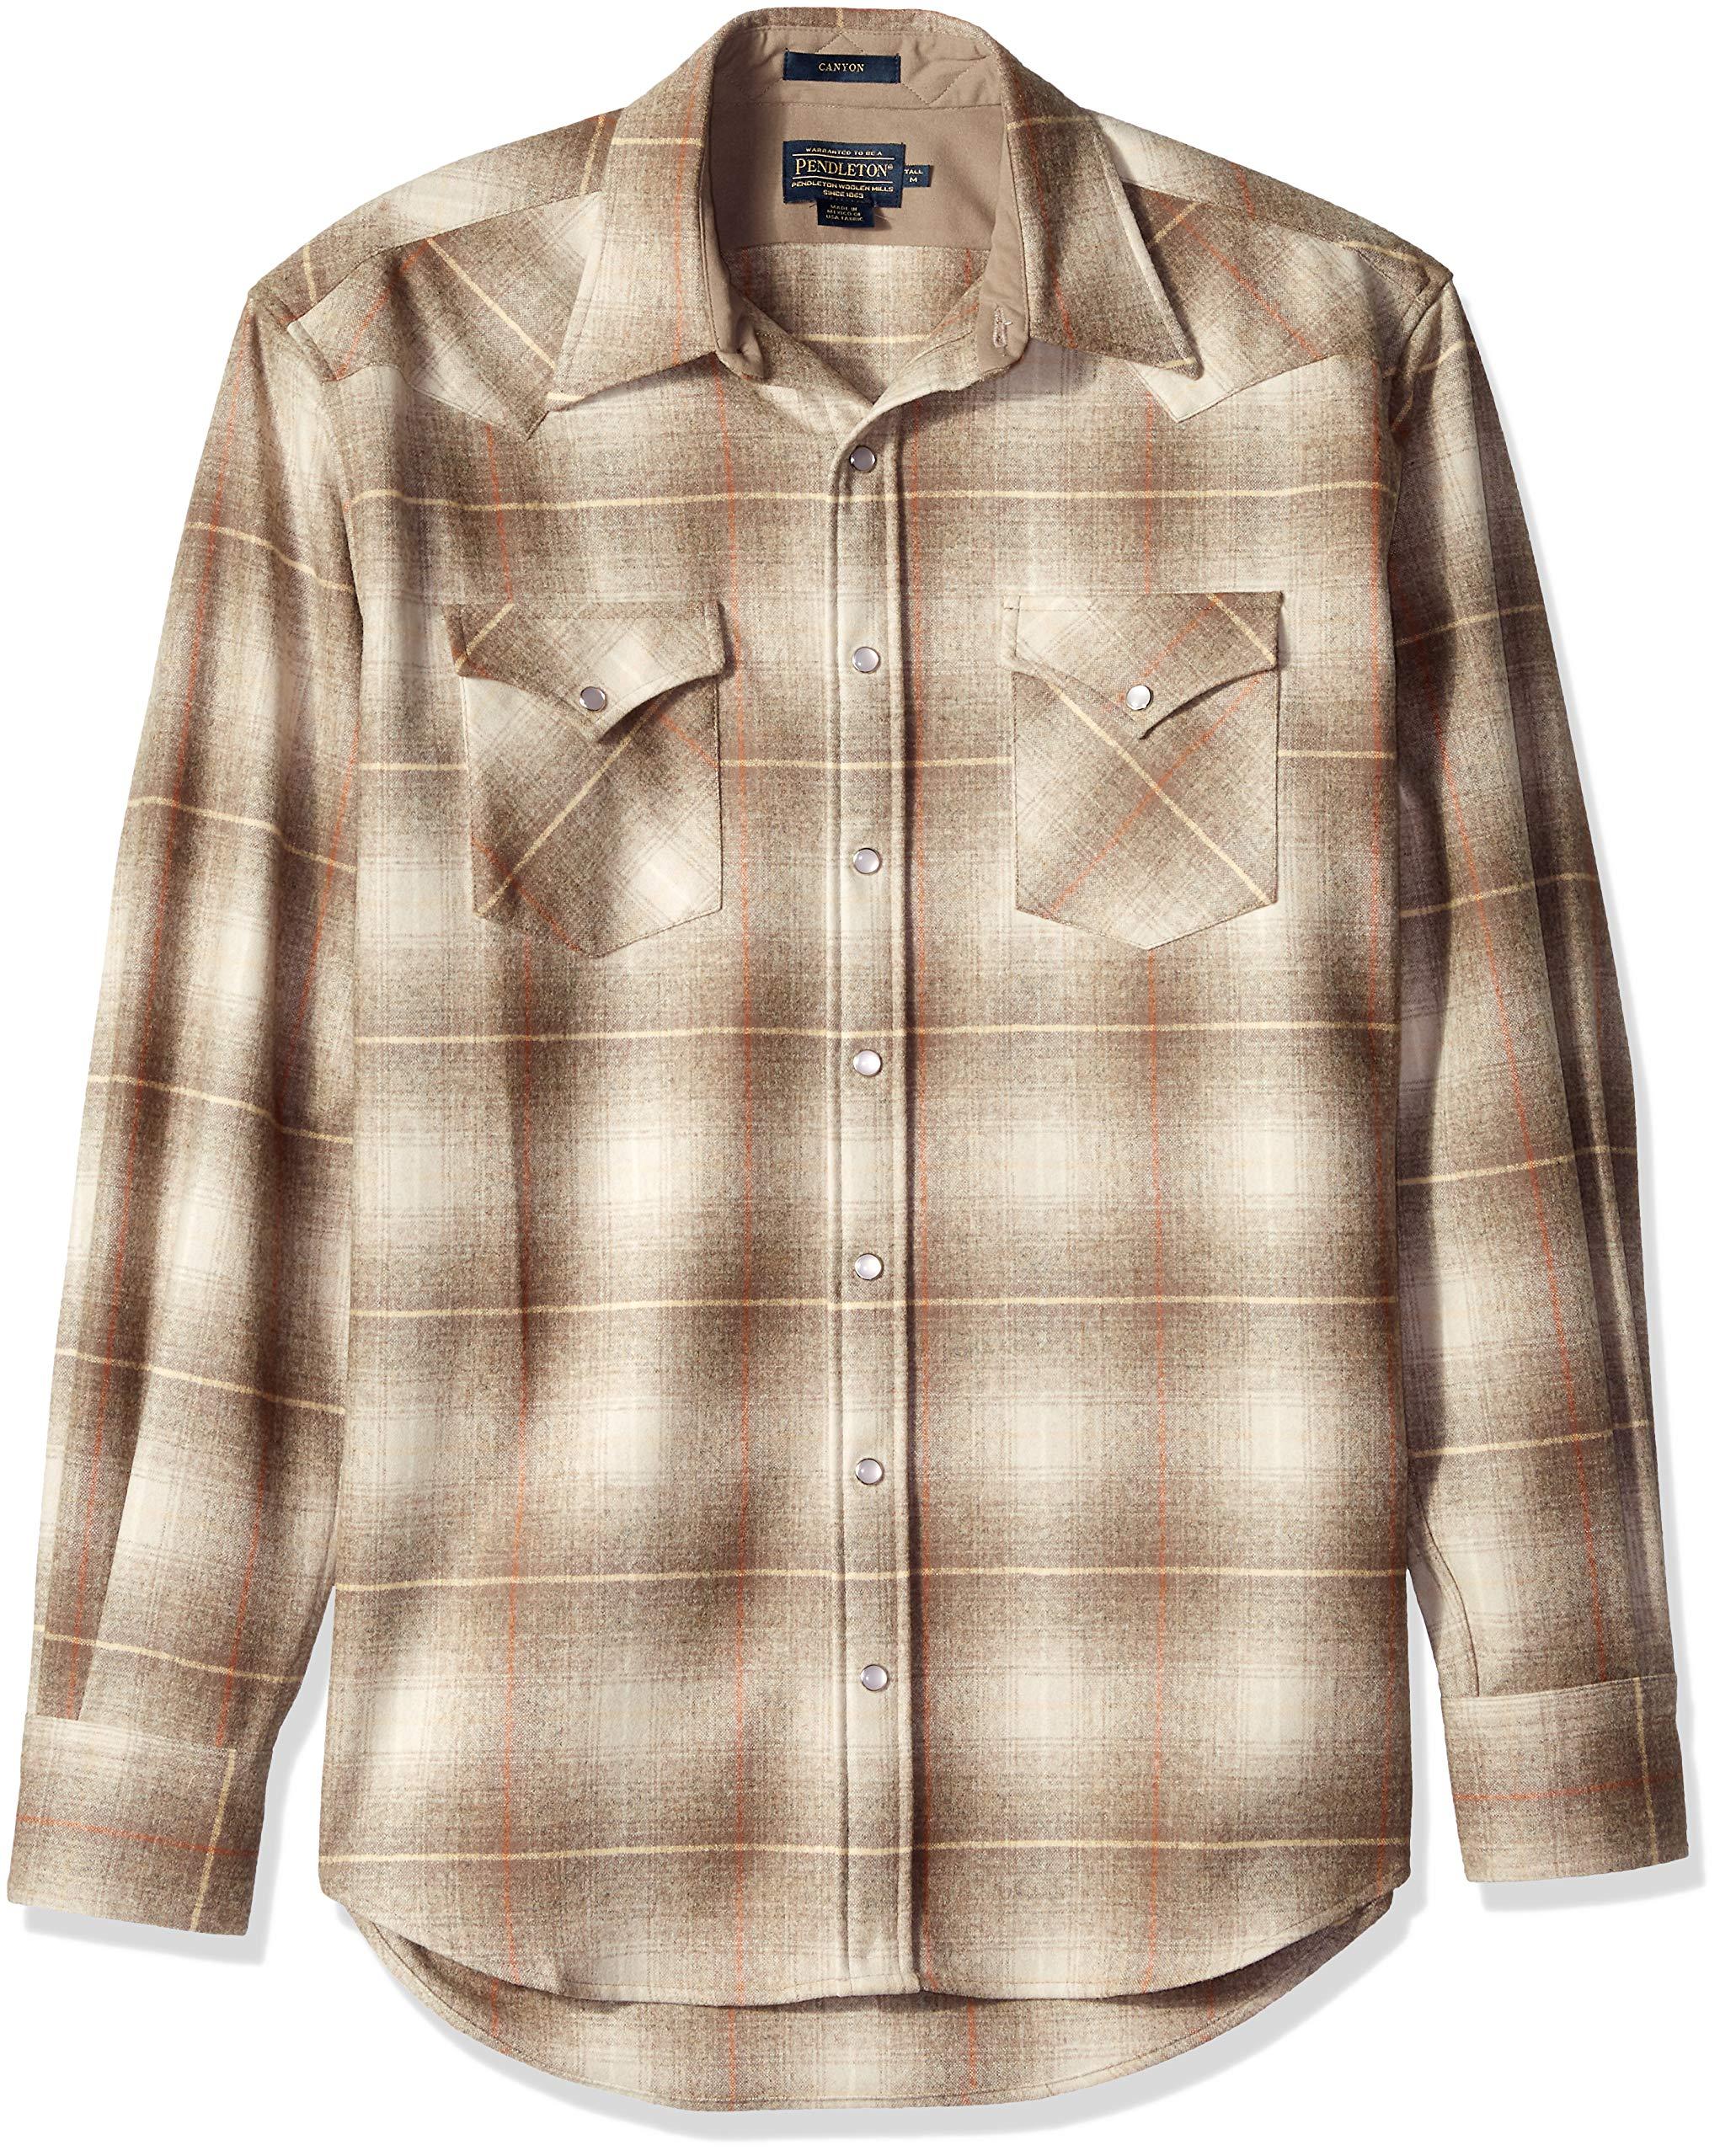 Pendleton Men's Tall Size Big & Tall Long Sleeve Canyon Shirt, Santa Clara tan XL